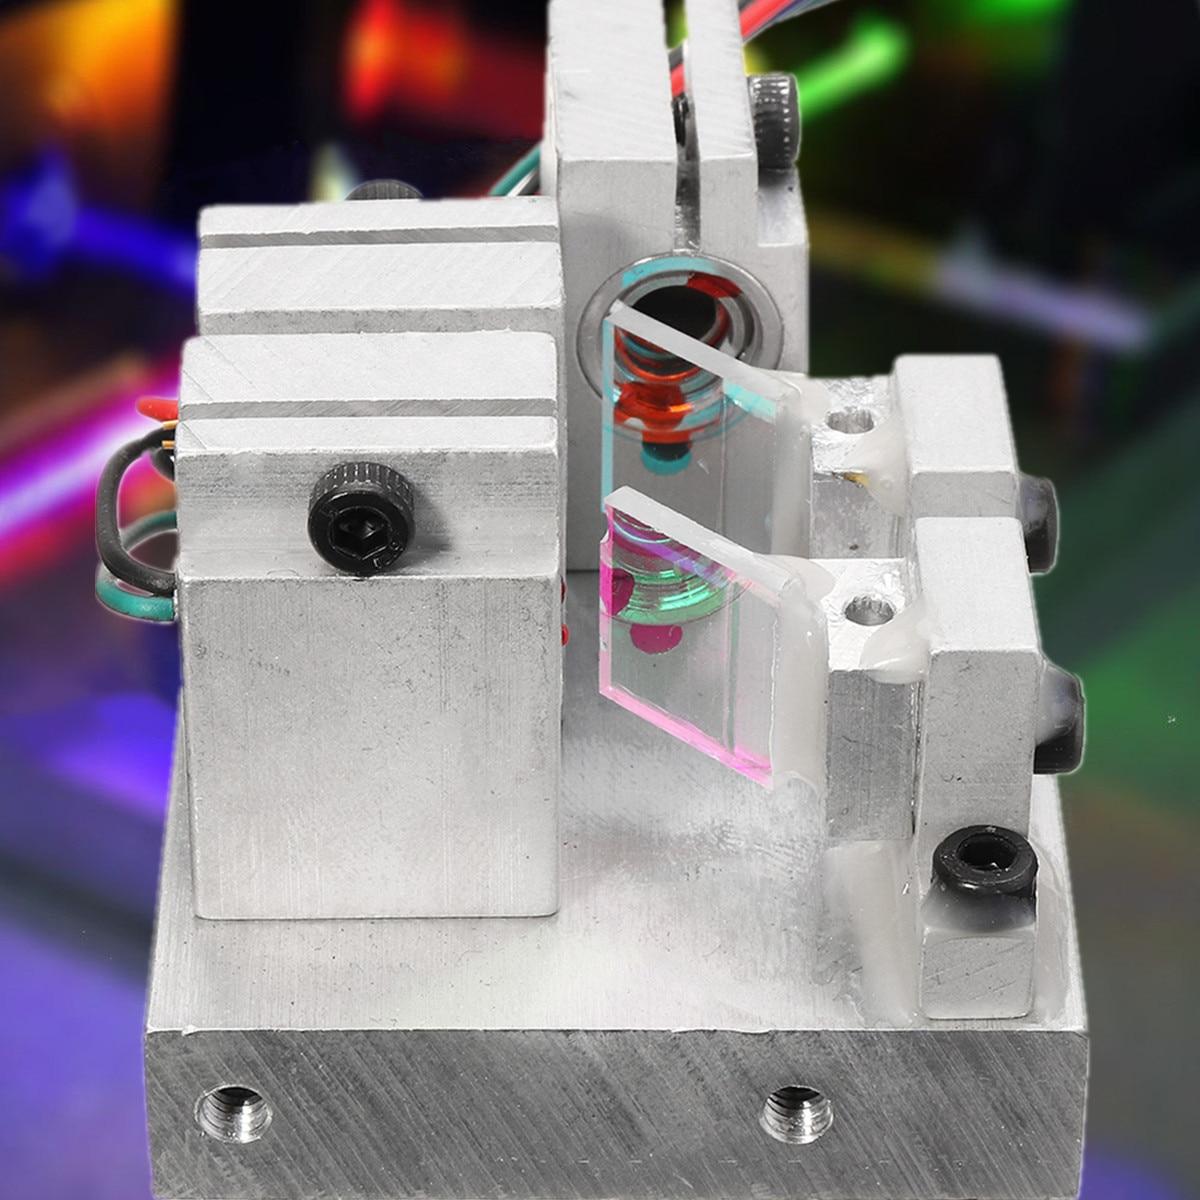 RGB 300mW 638nm+520nm+450nm White Laser Module With TTL Driver Board Modulation Temperature Protection Precision Science